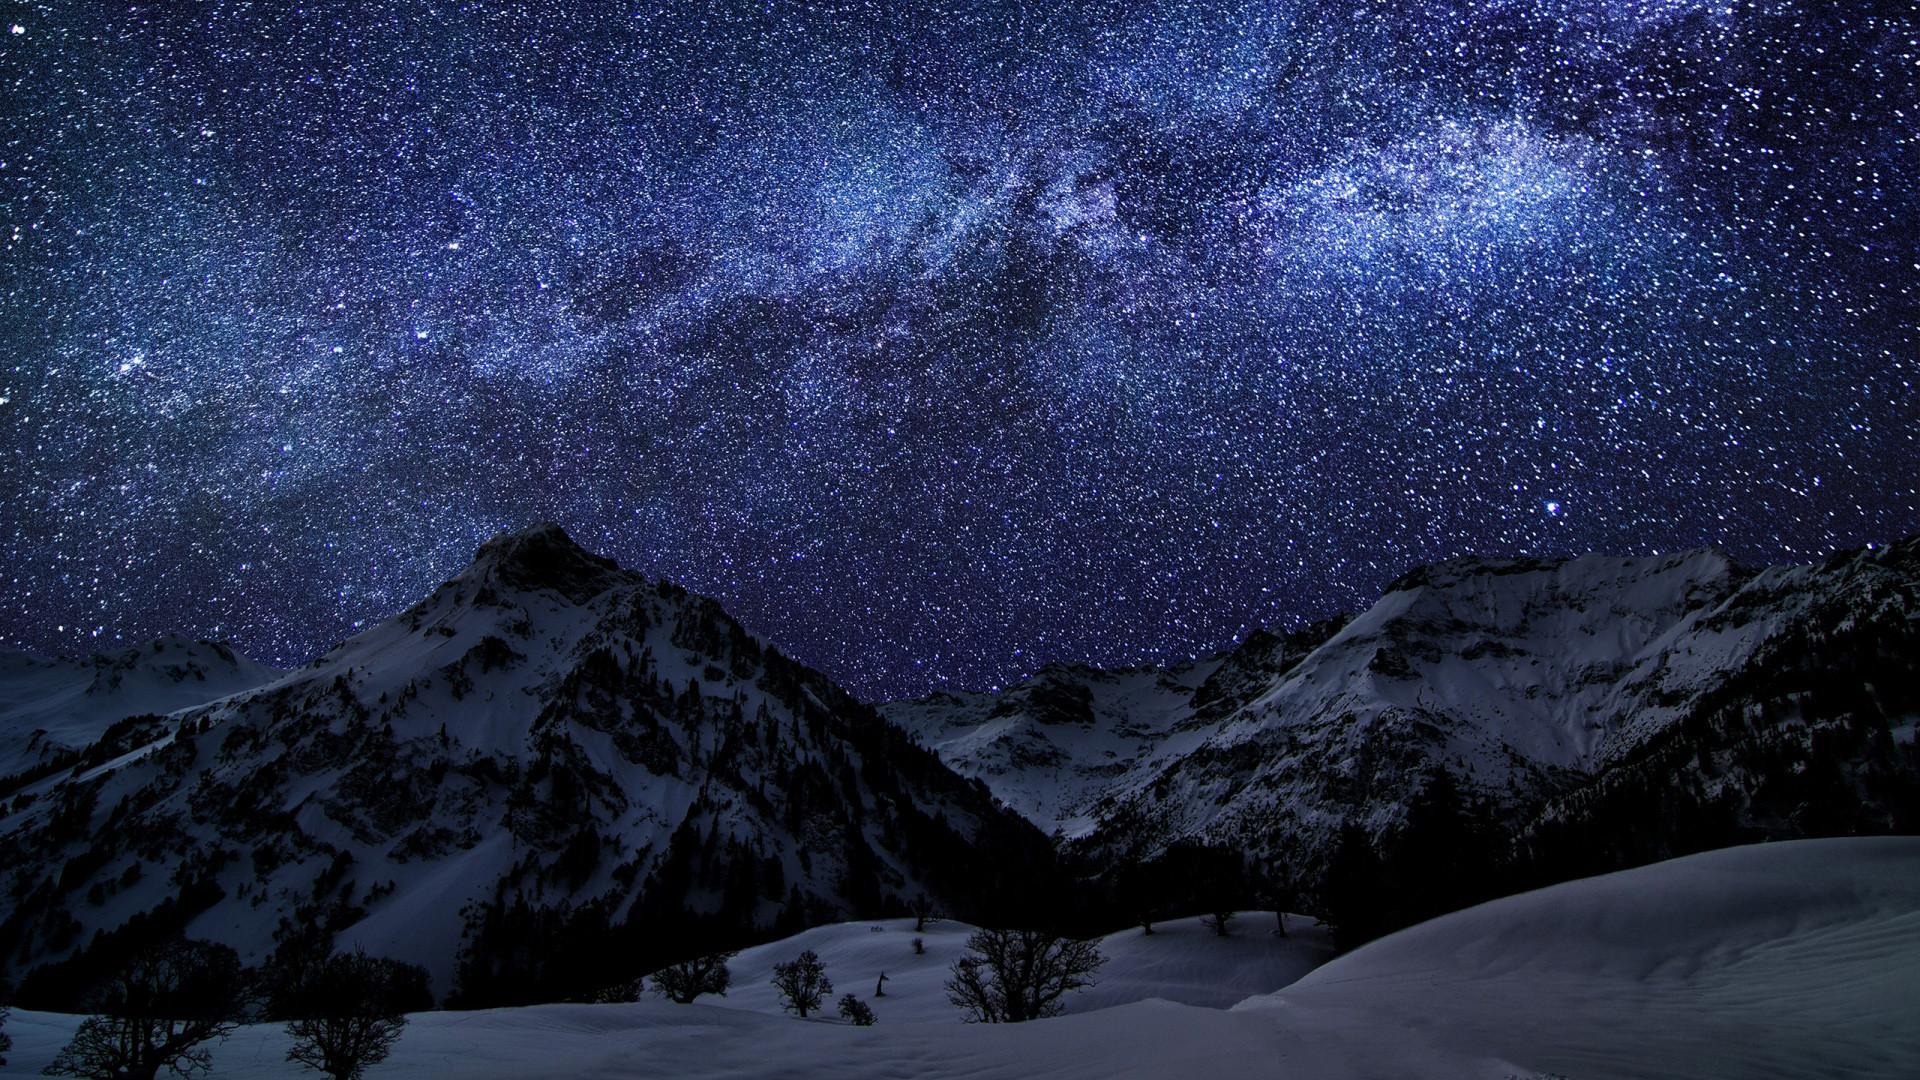 Winter Stars Sky Night Mountains Desktop Wallpaper